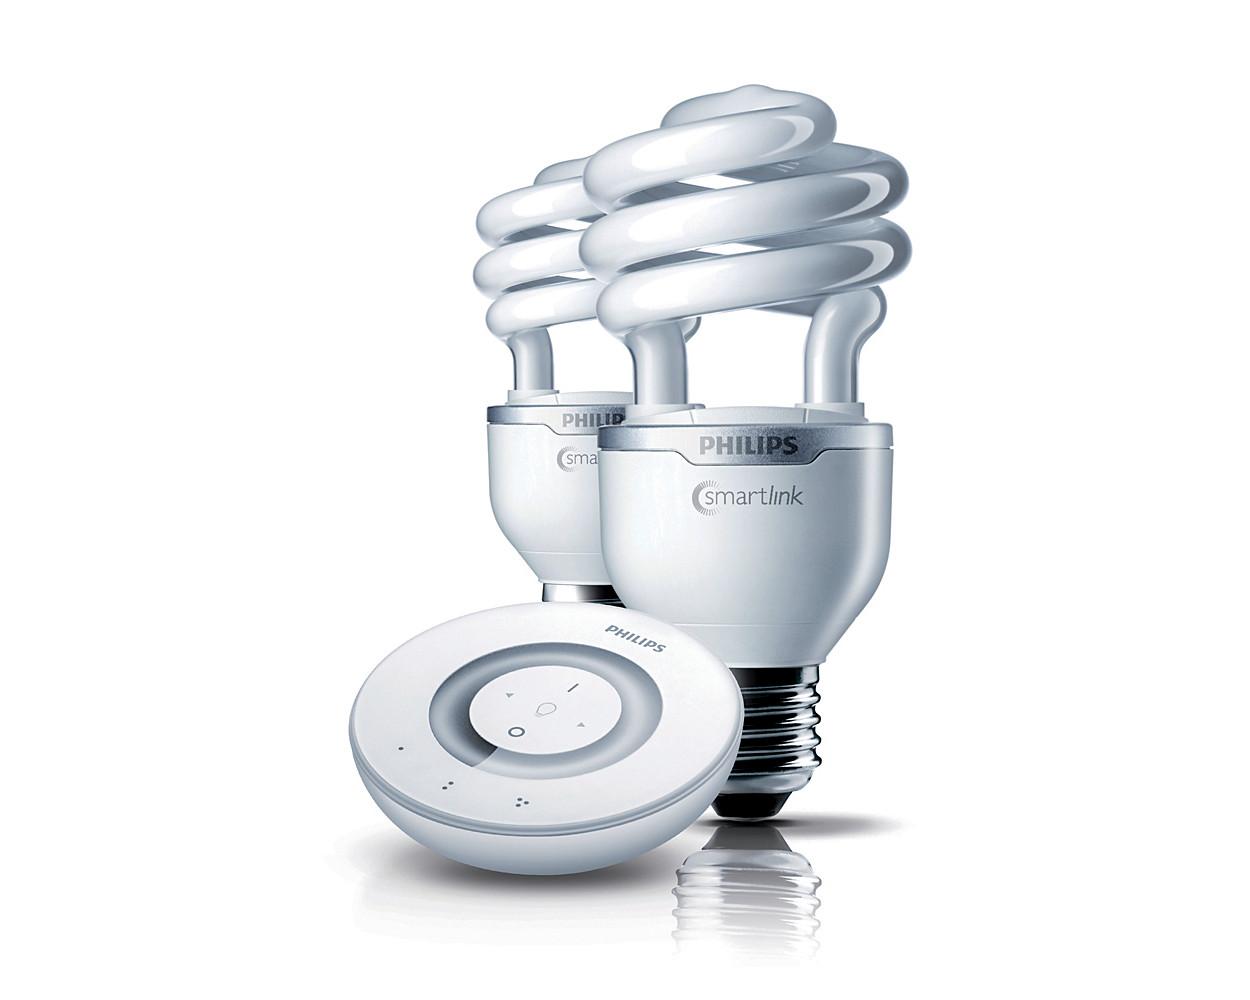 about philips energy saving light bulb bayonet b22 living whites bulbs. Black Bedroom Furniture Sets. Home Design Ideas